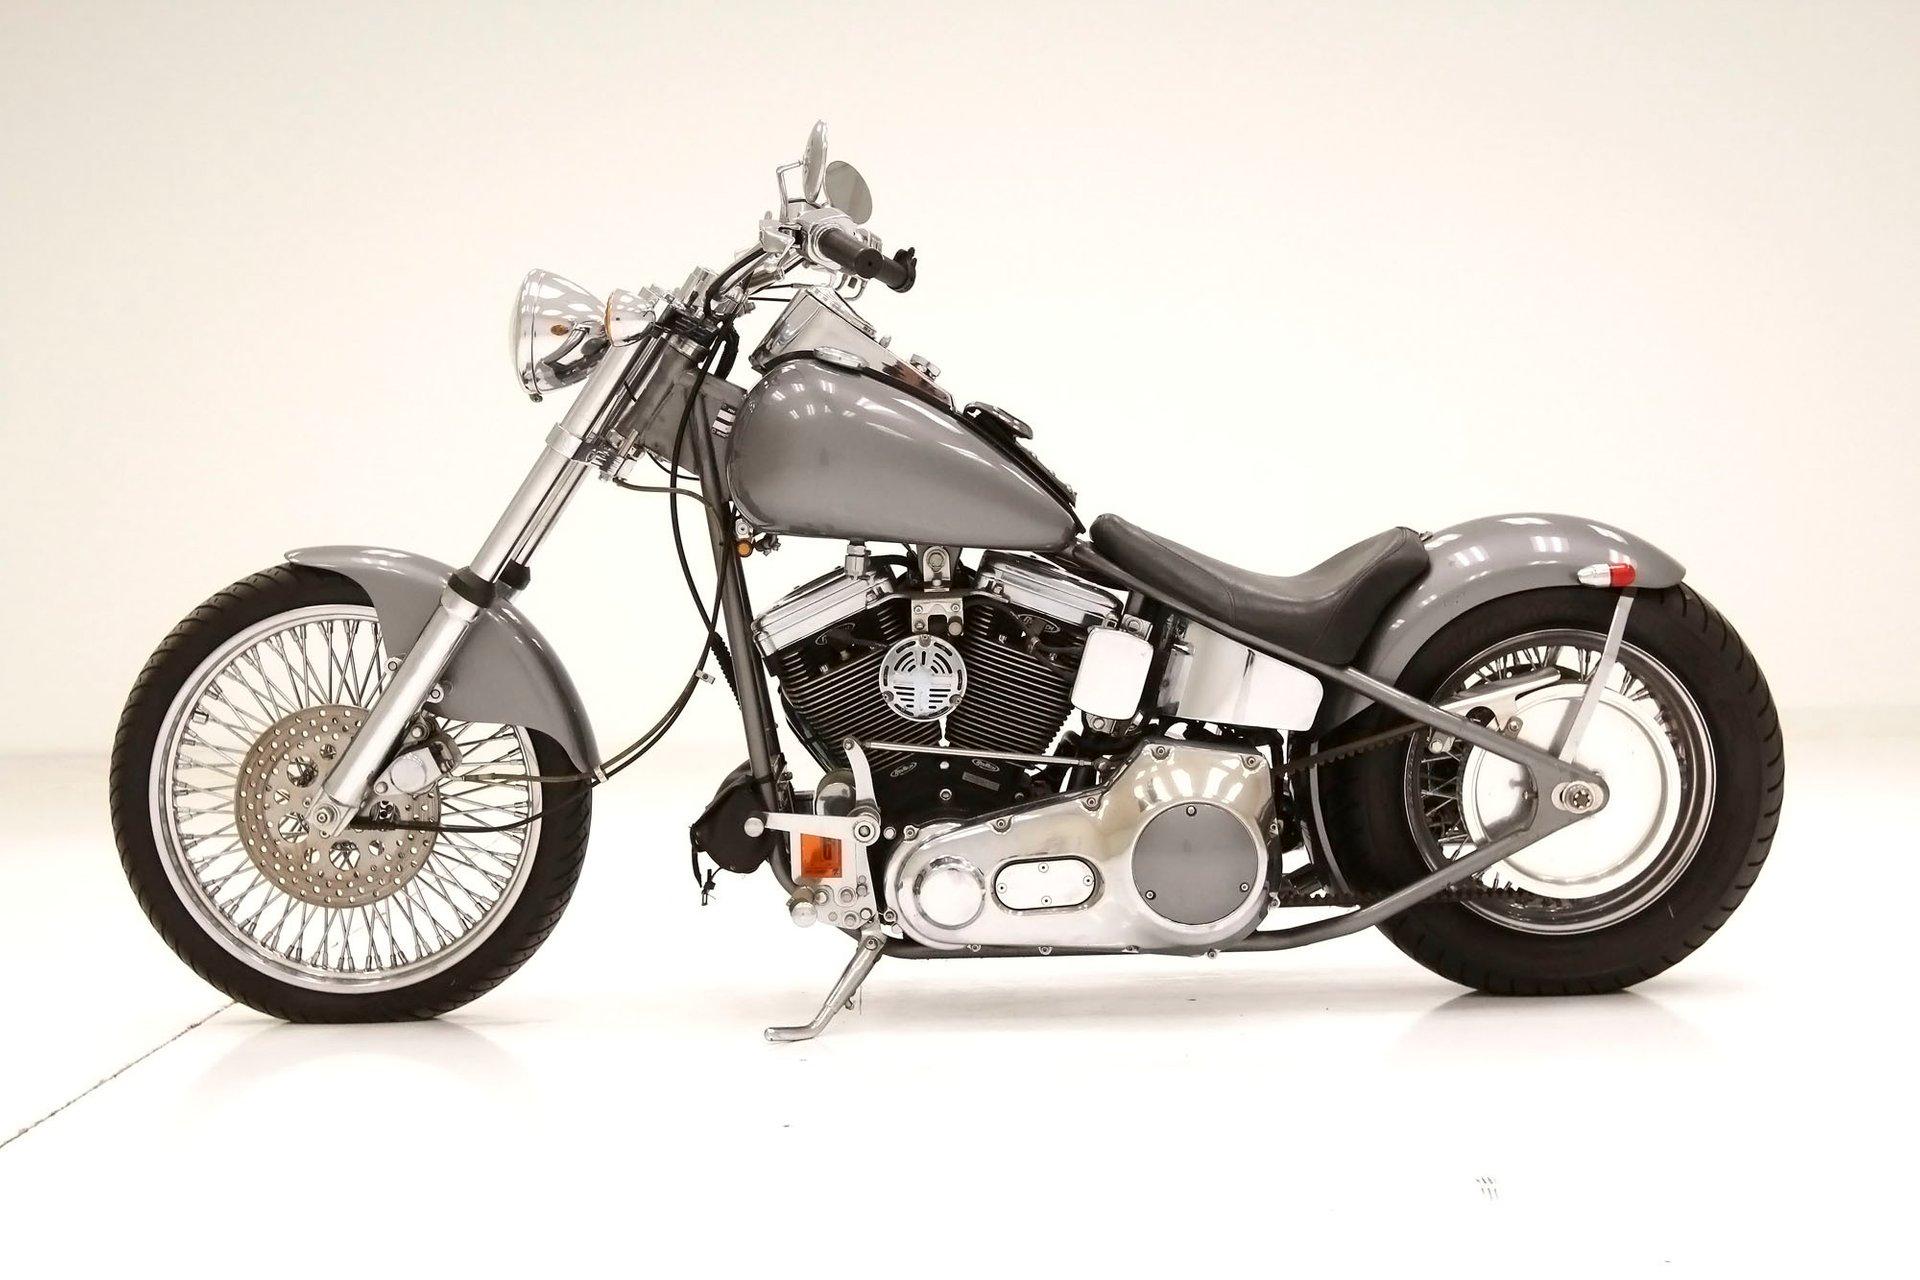 2002 Harley-Davidson Deluxe